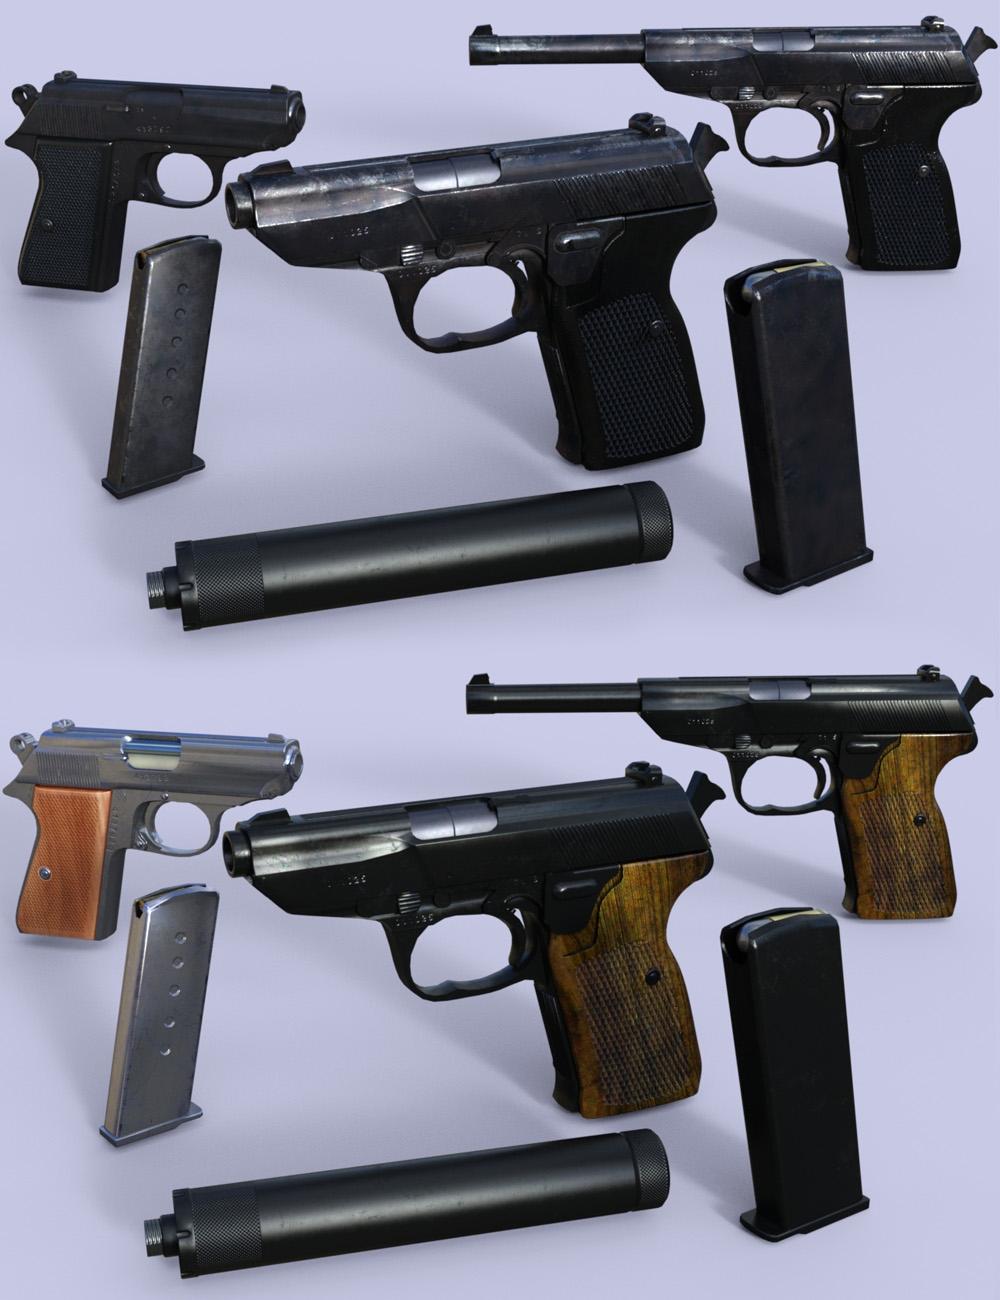 Spy Pistols by: DzFire, 3D Models by Daz 3D